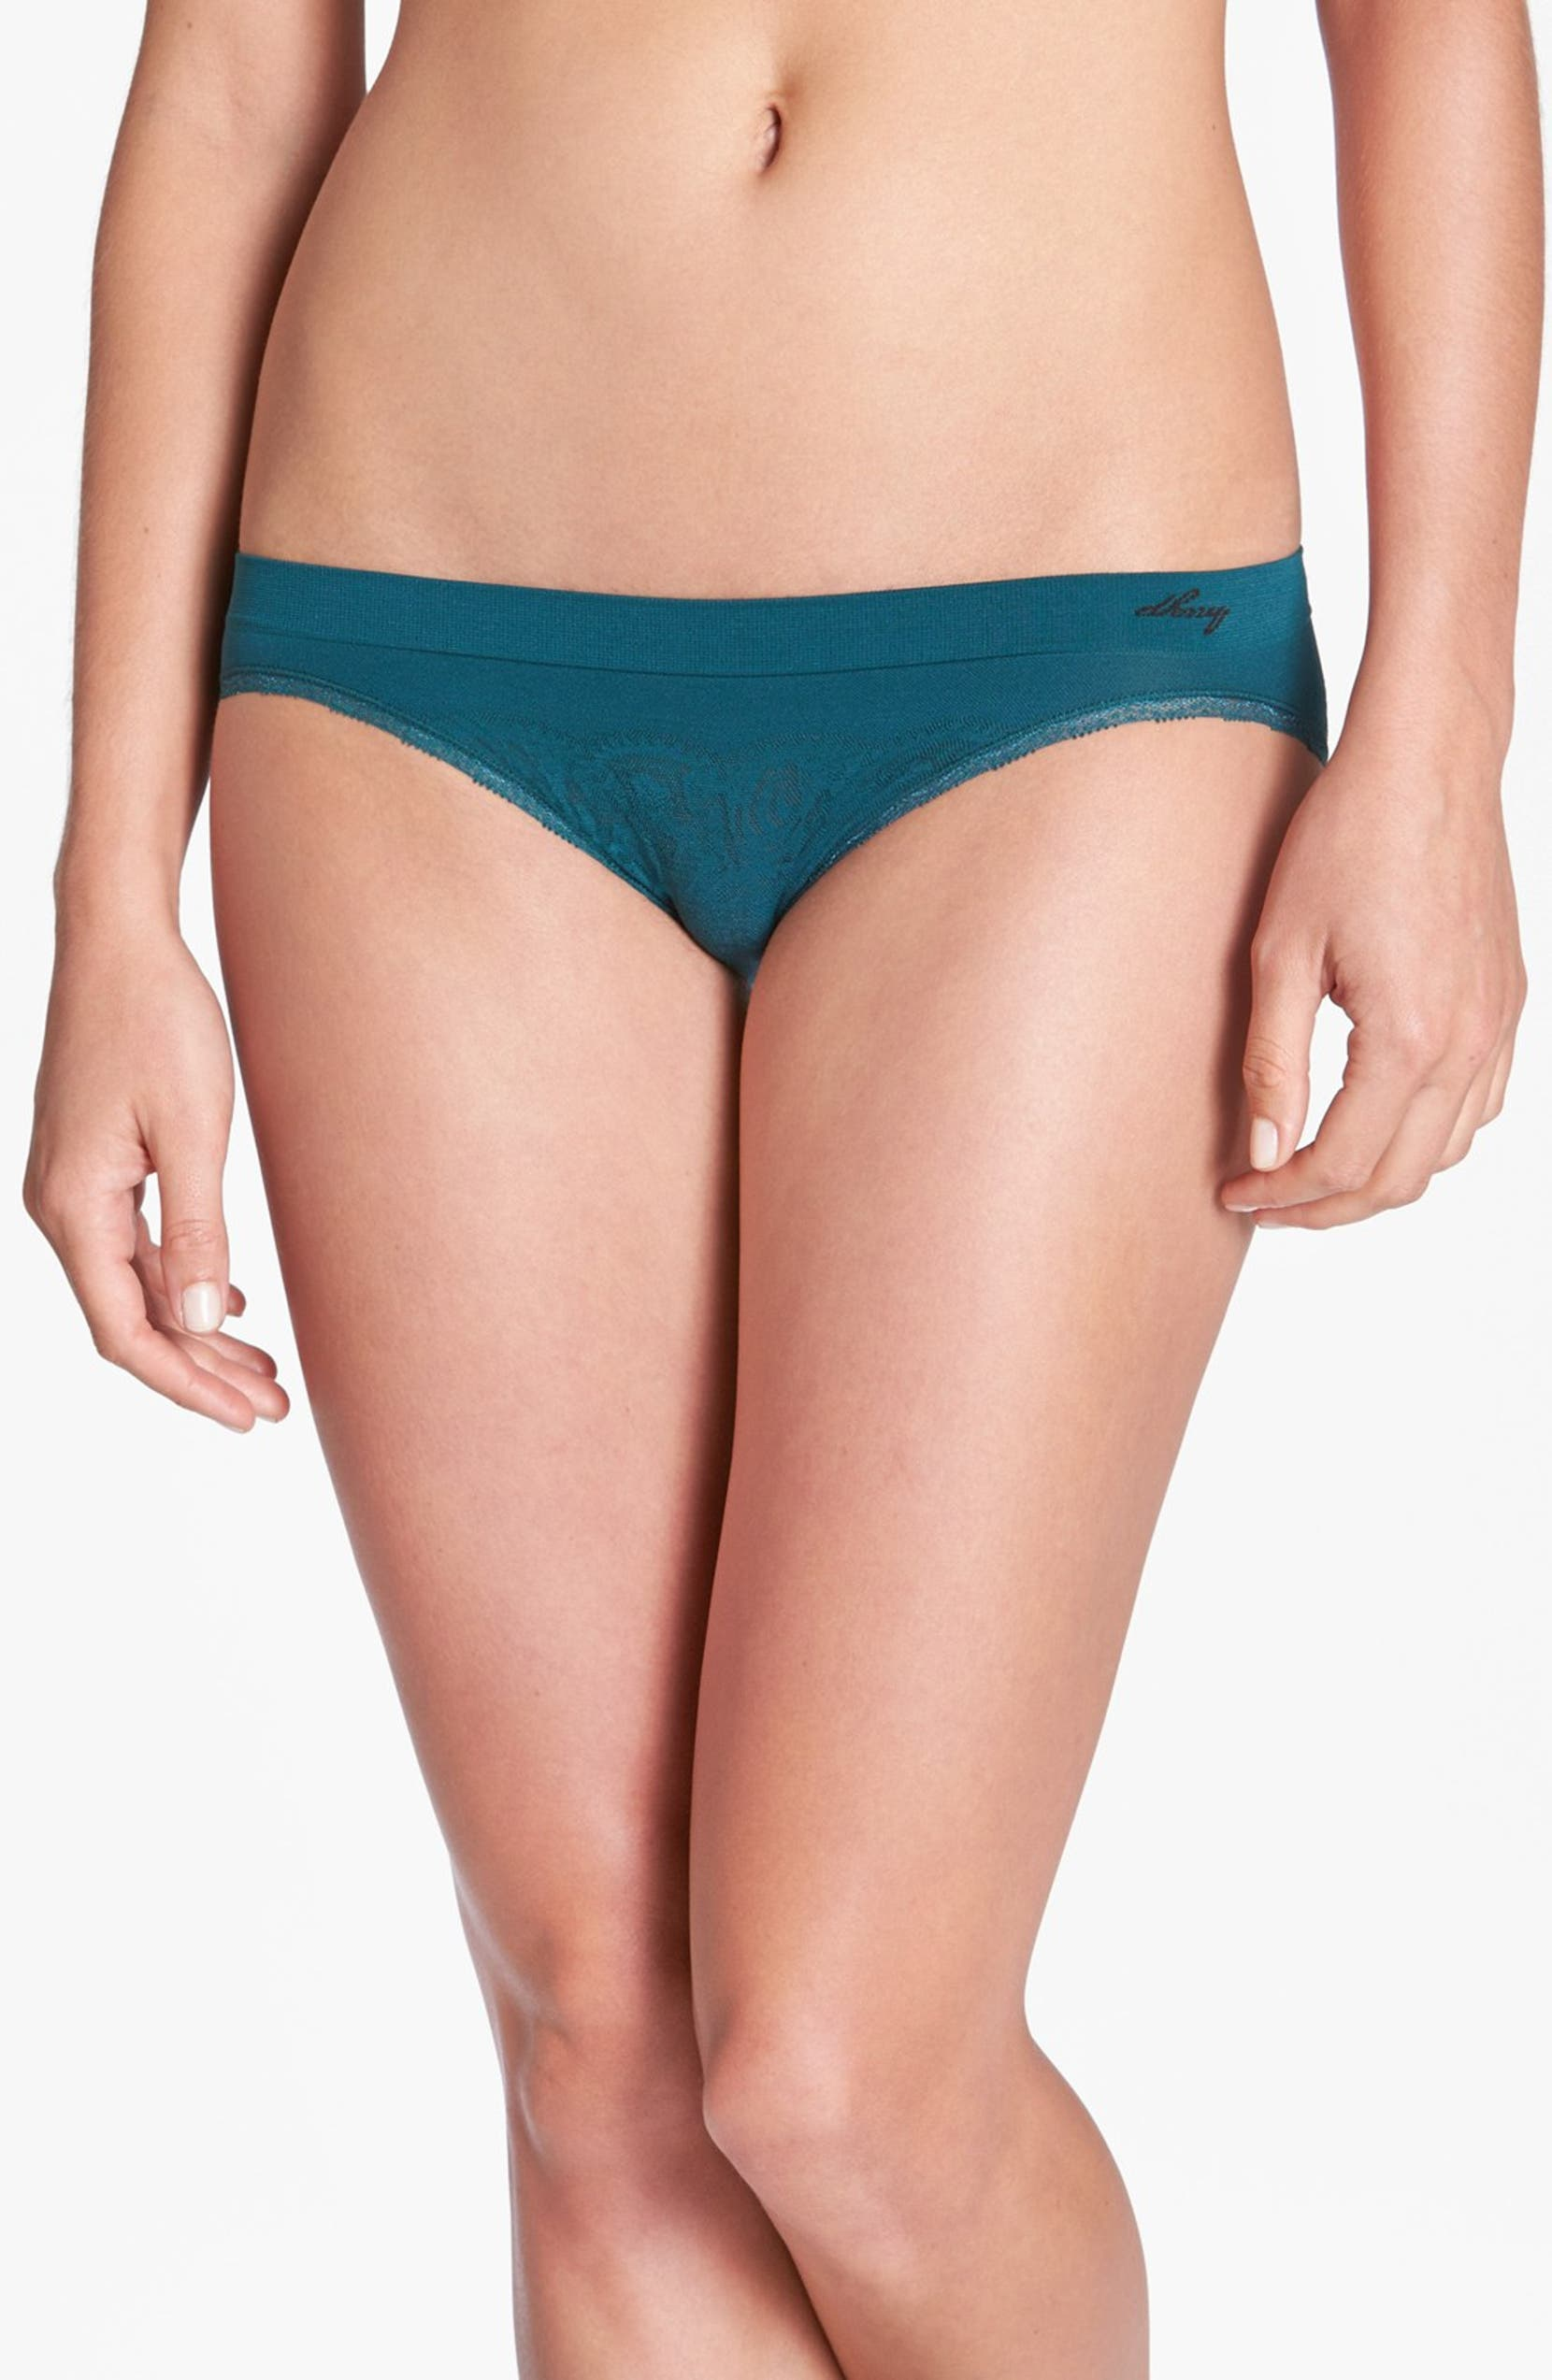 bfd7b77c6528 DKNY 'Fusion Lace' Seamless Bikini | Nordstrom